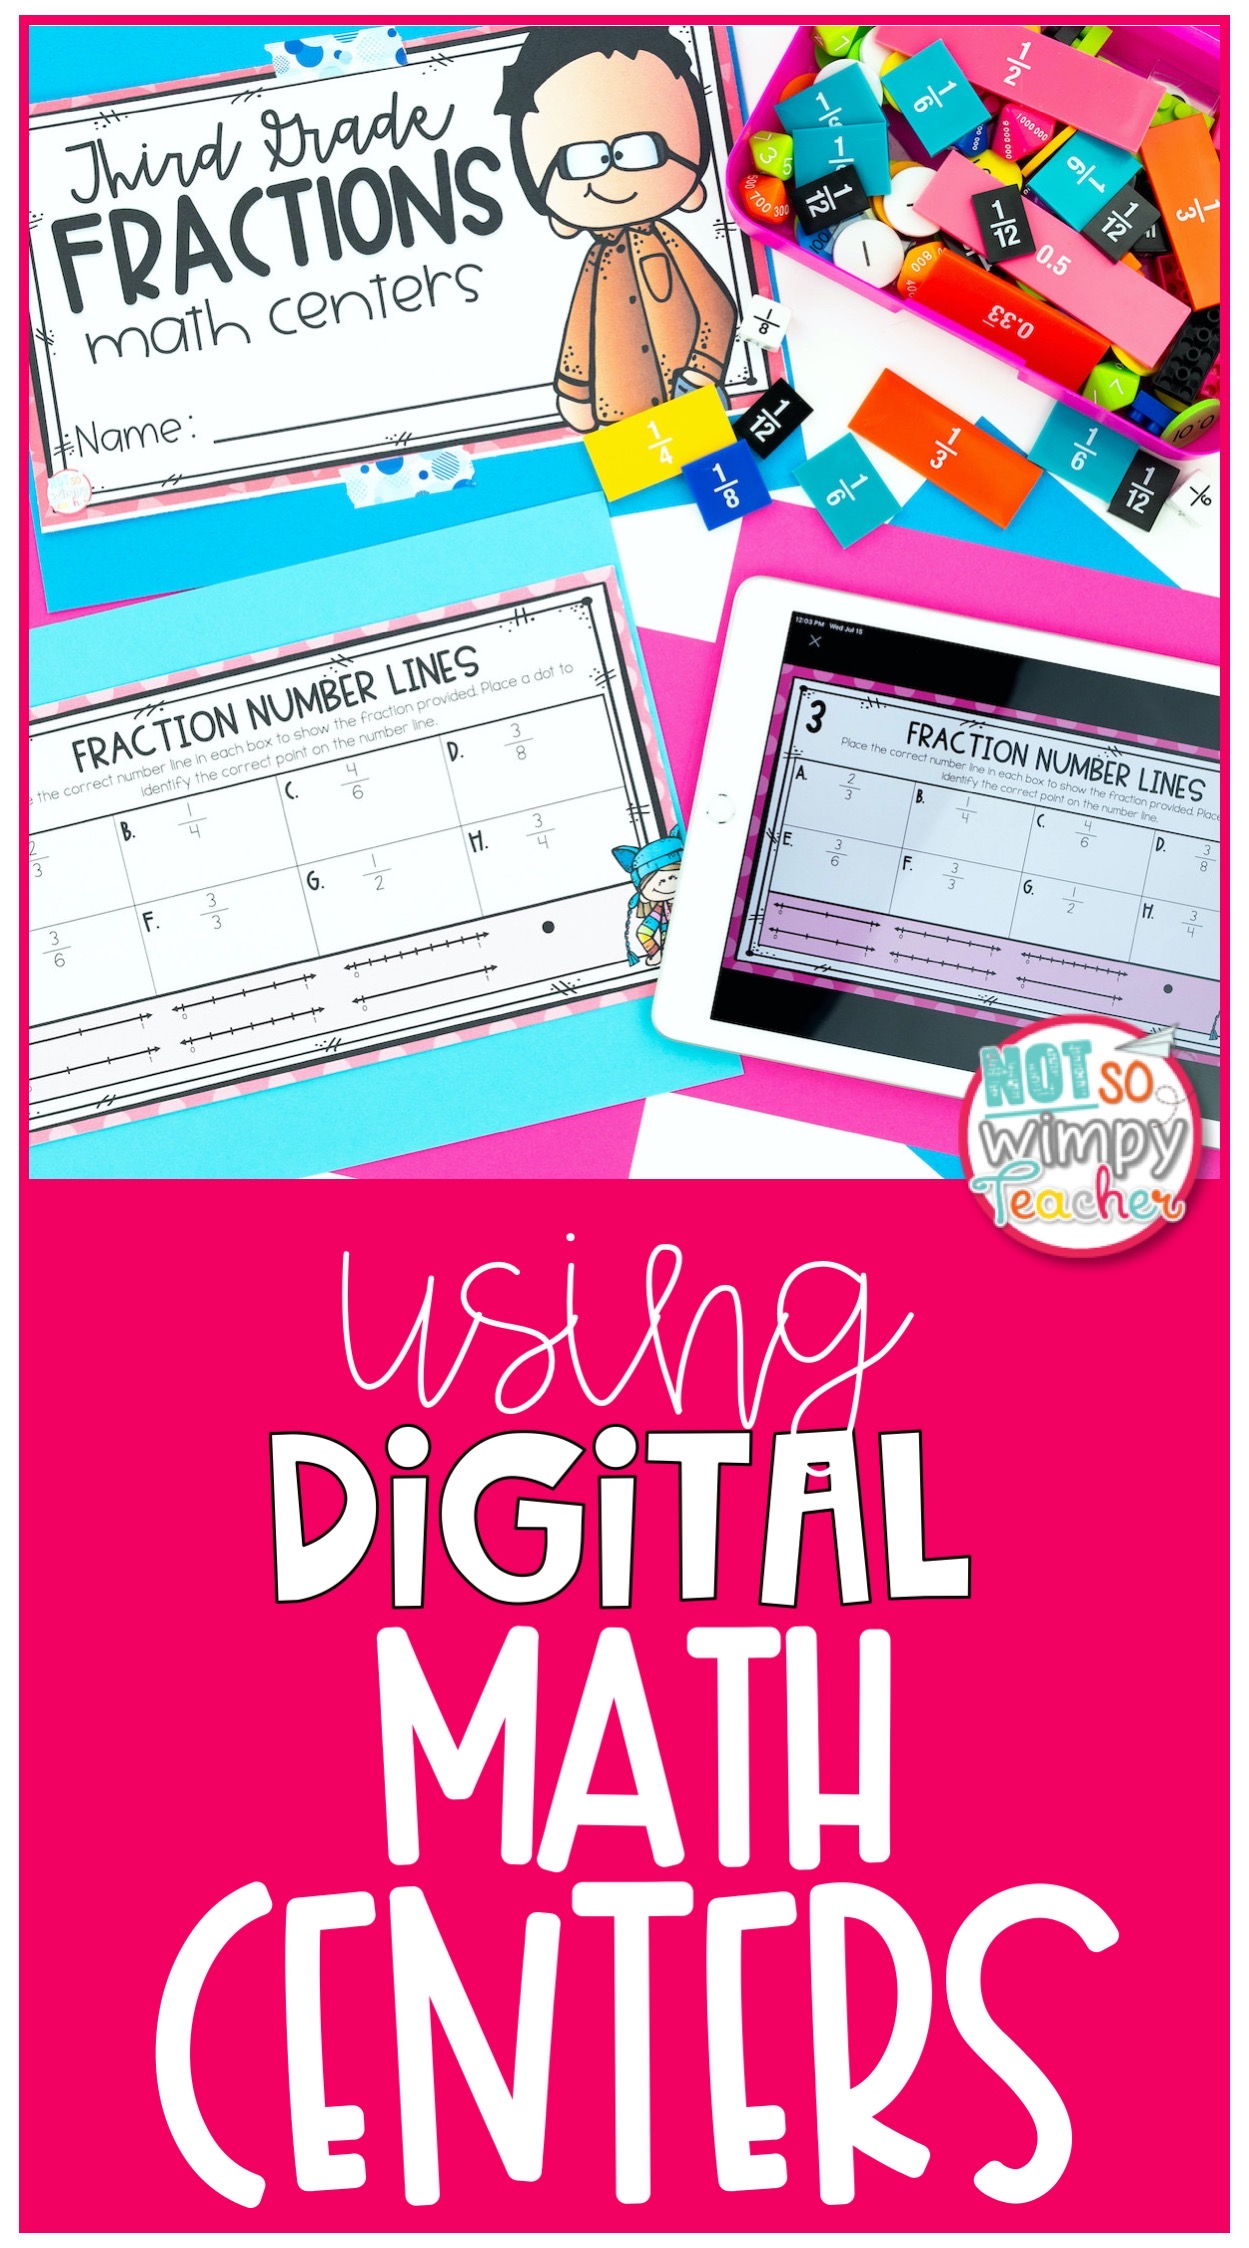 ipad with digital math center